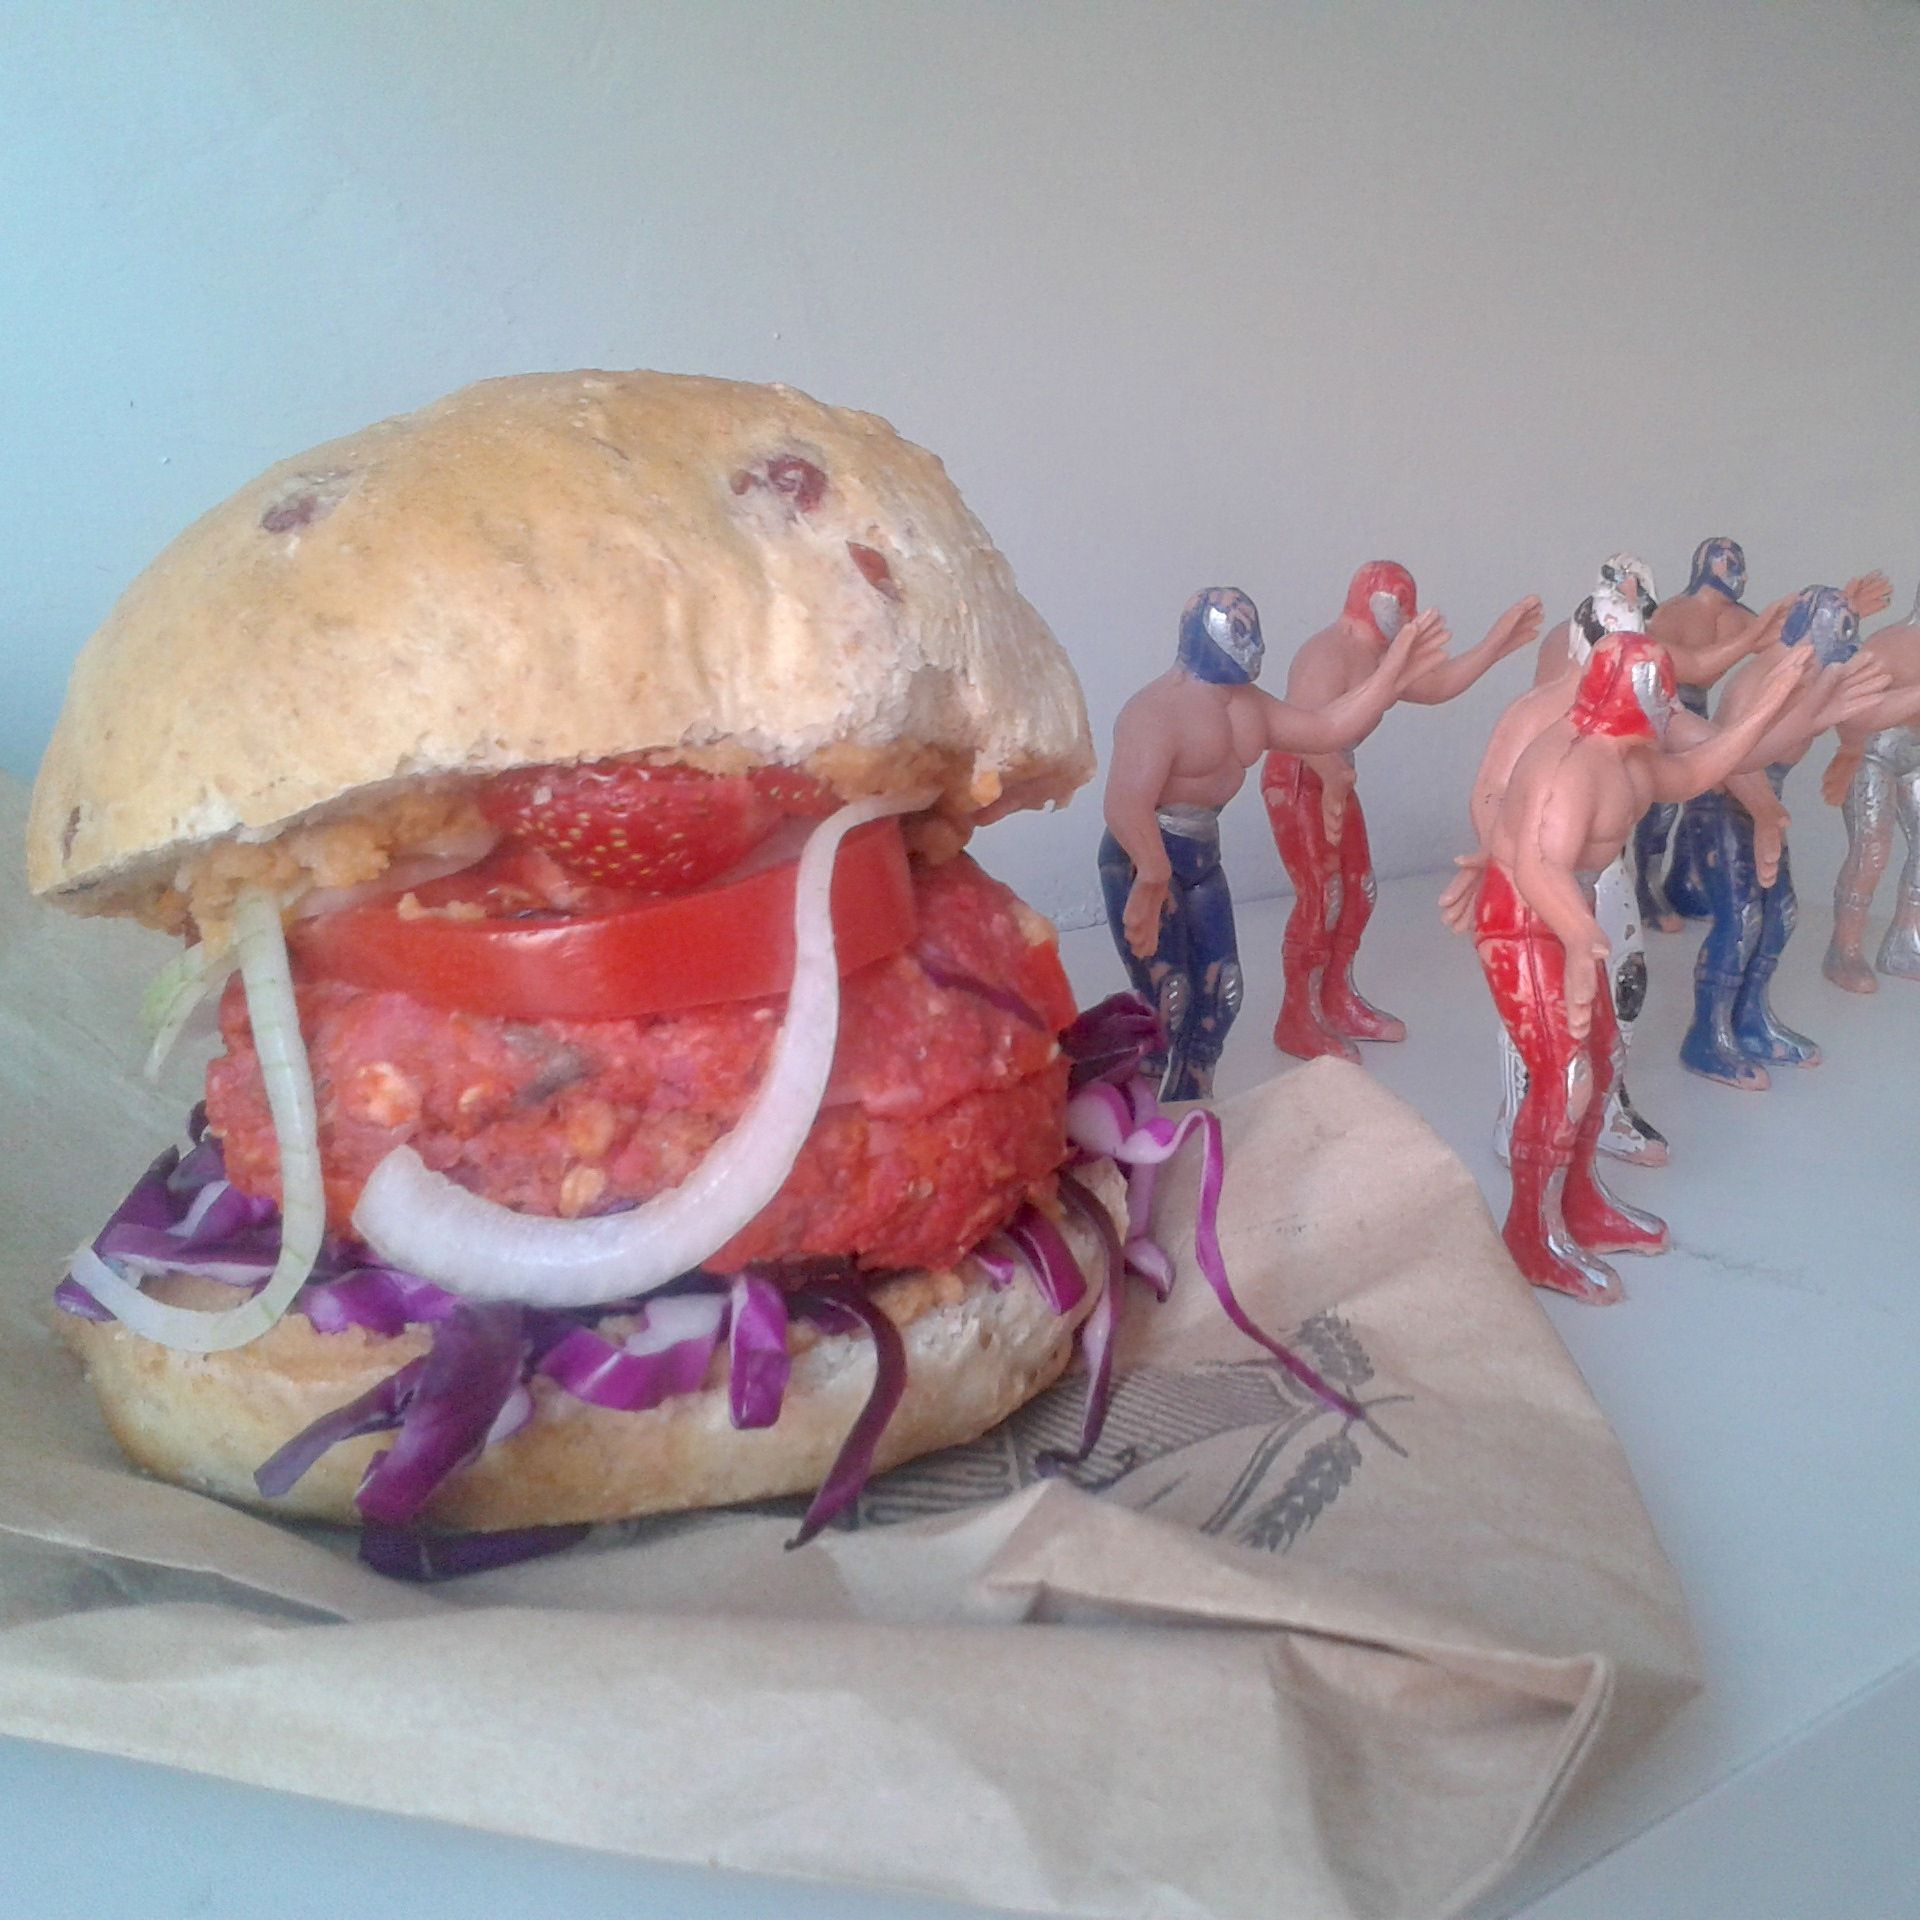 https://i2.wp.com/fatgayvegan.com/wp-content/uploads/2014/02/red-burger.jpg?fit=1920%2C1920